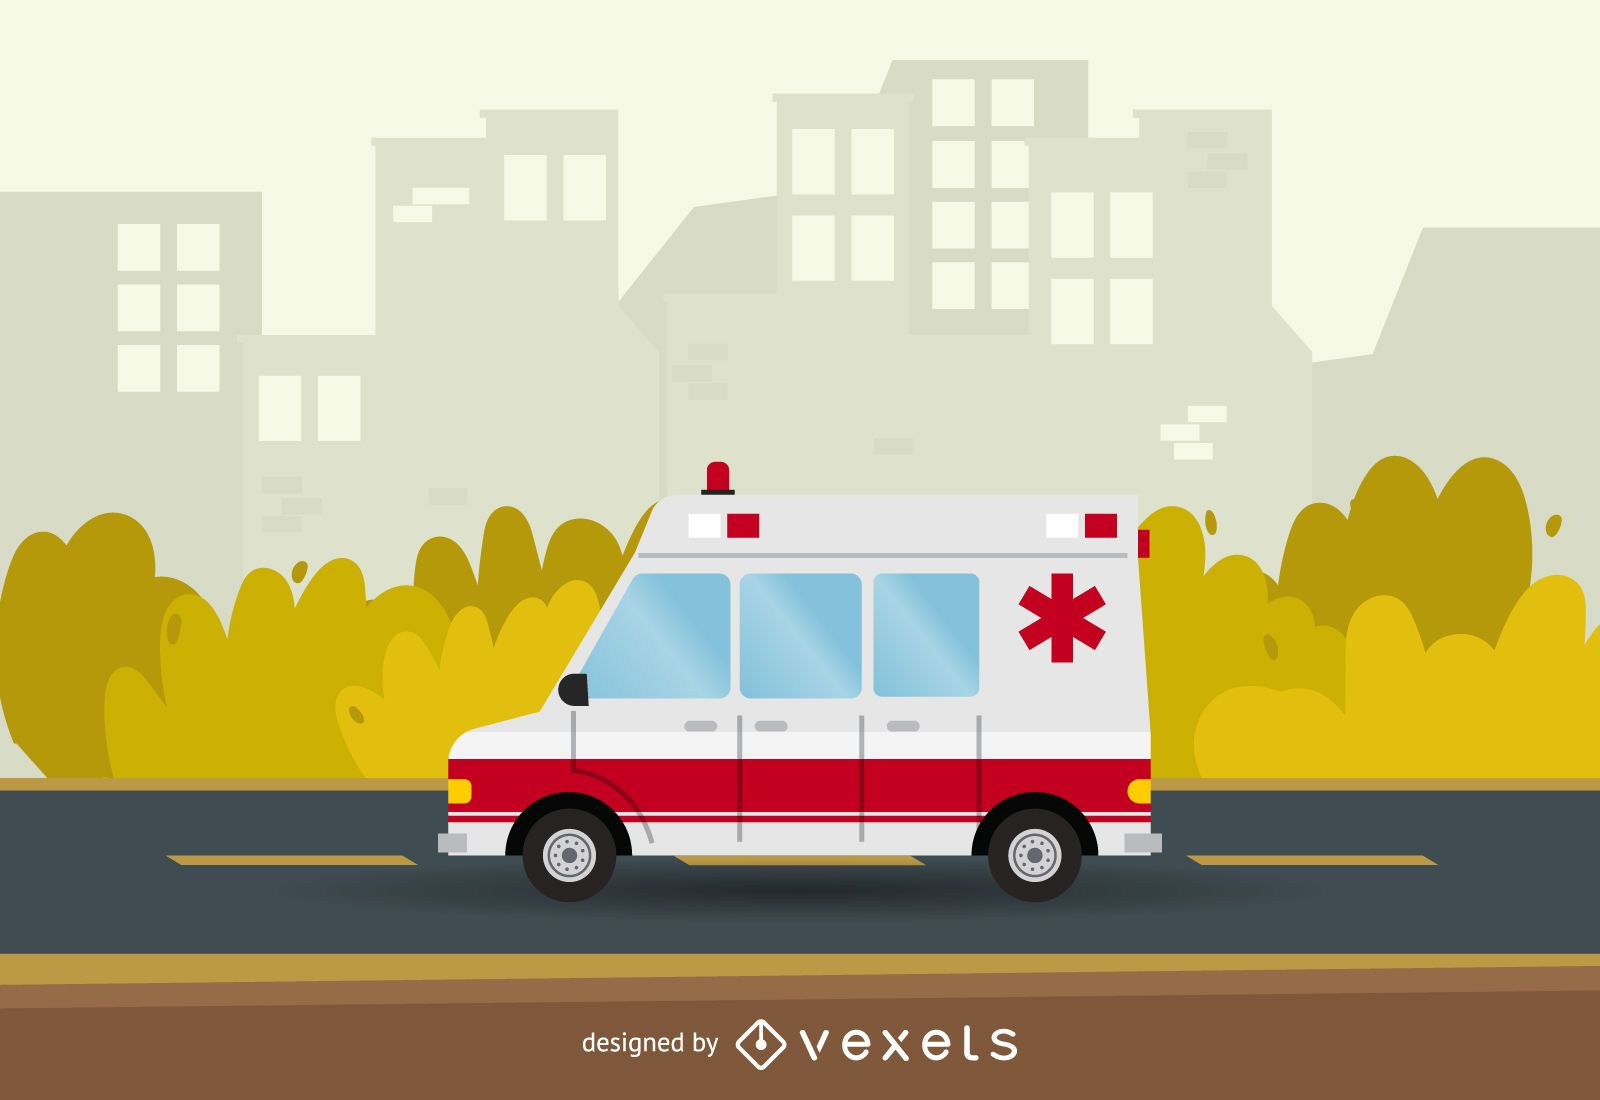 Hospital Ambulance Illustration